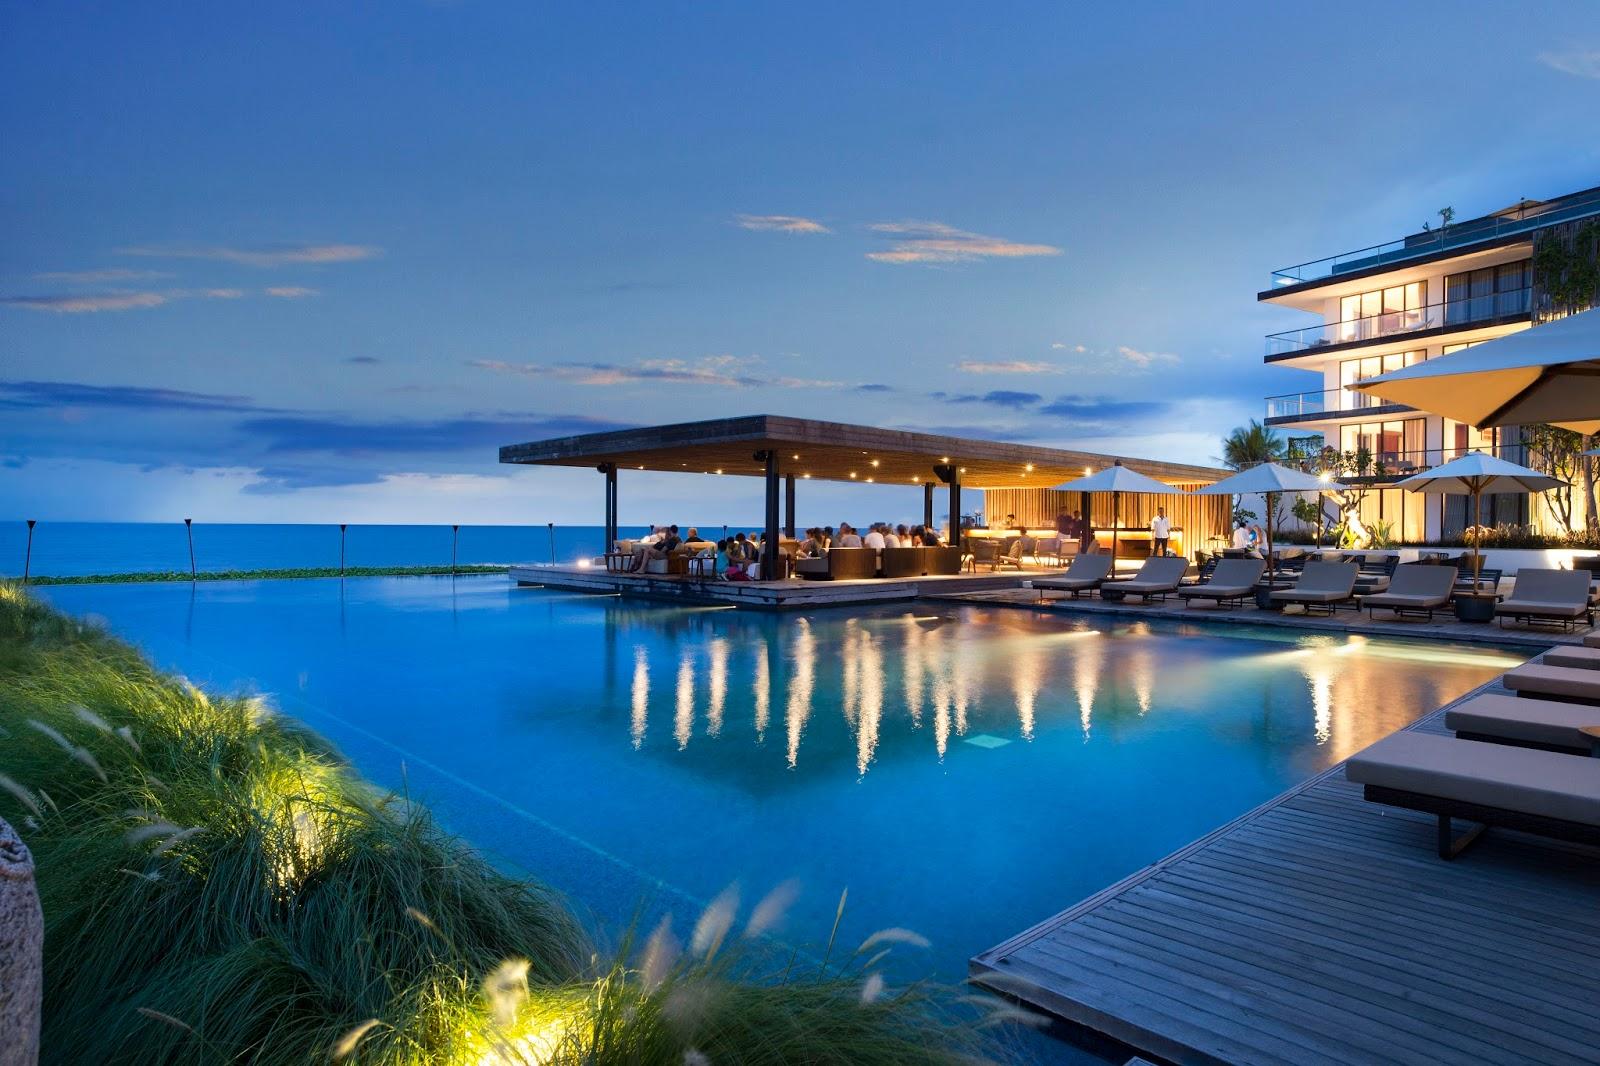 Burhan Abe\'s Blog: The Restaurant & Beach Bar @ Alila Seminyak